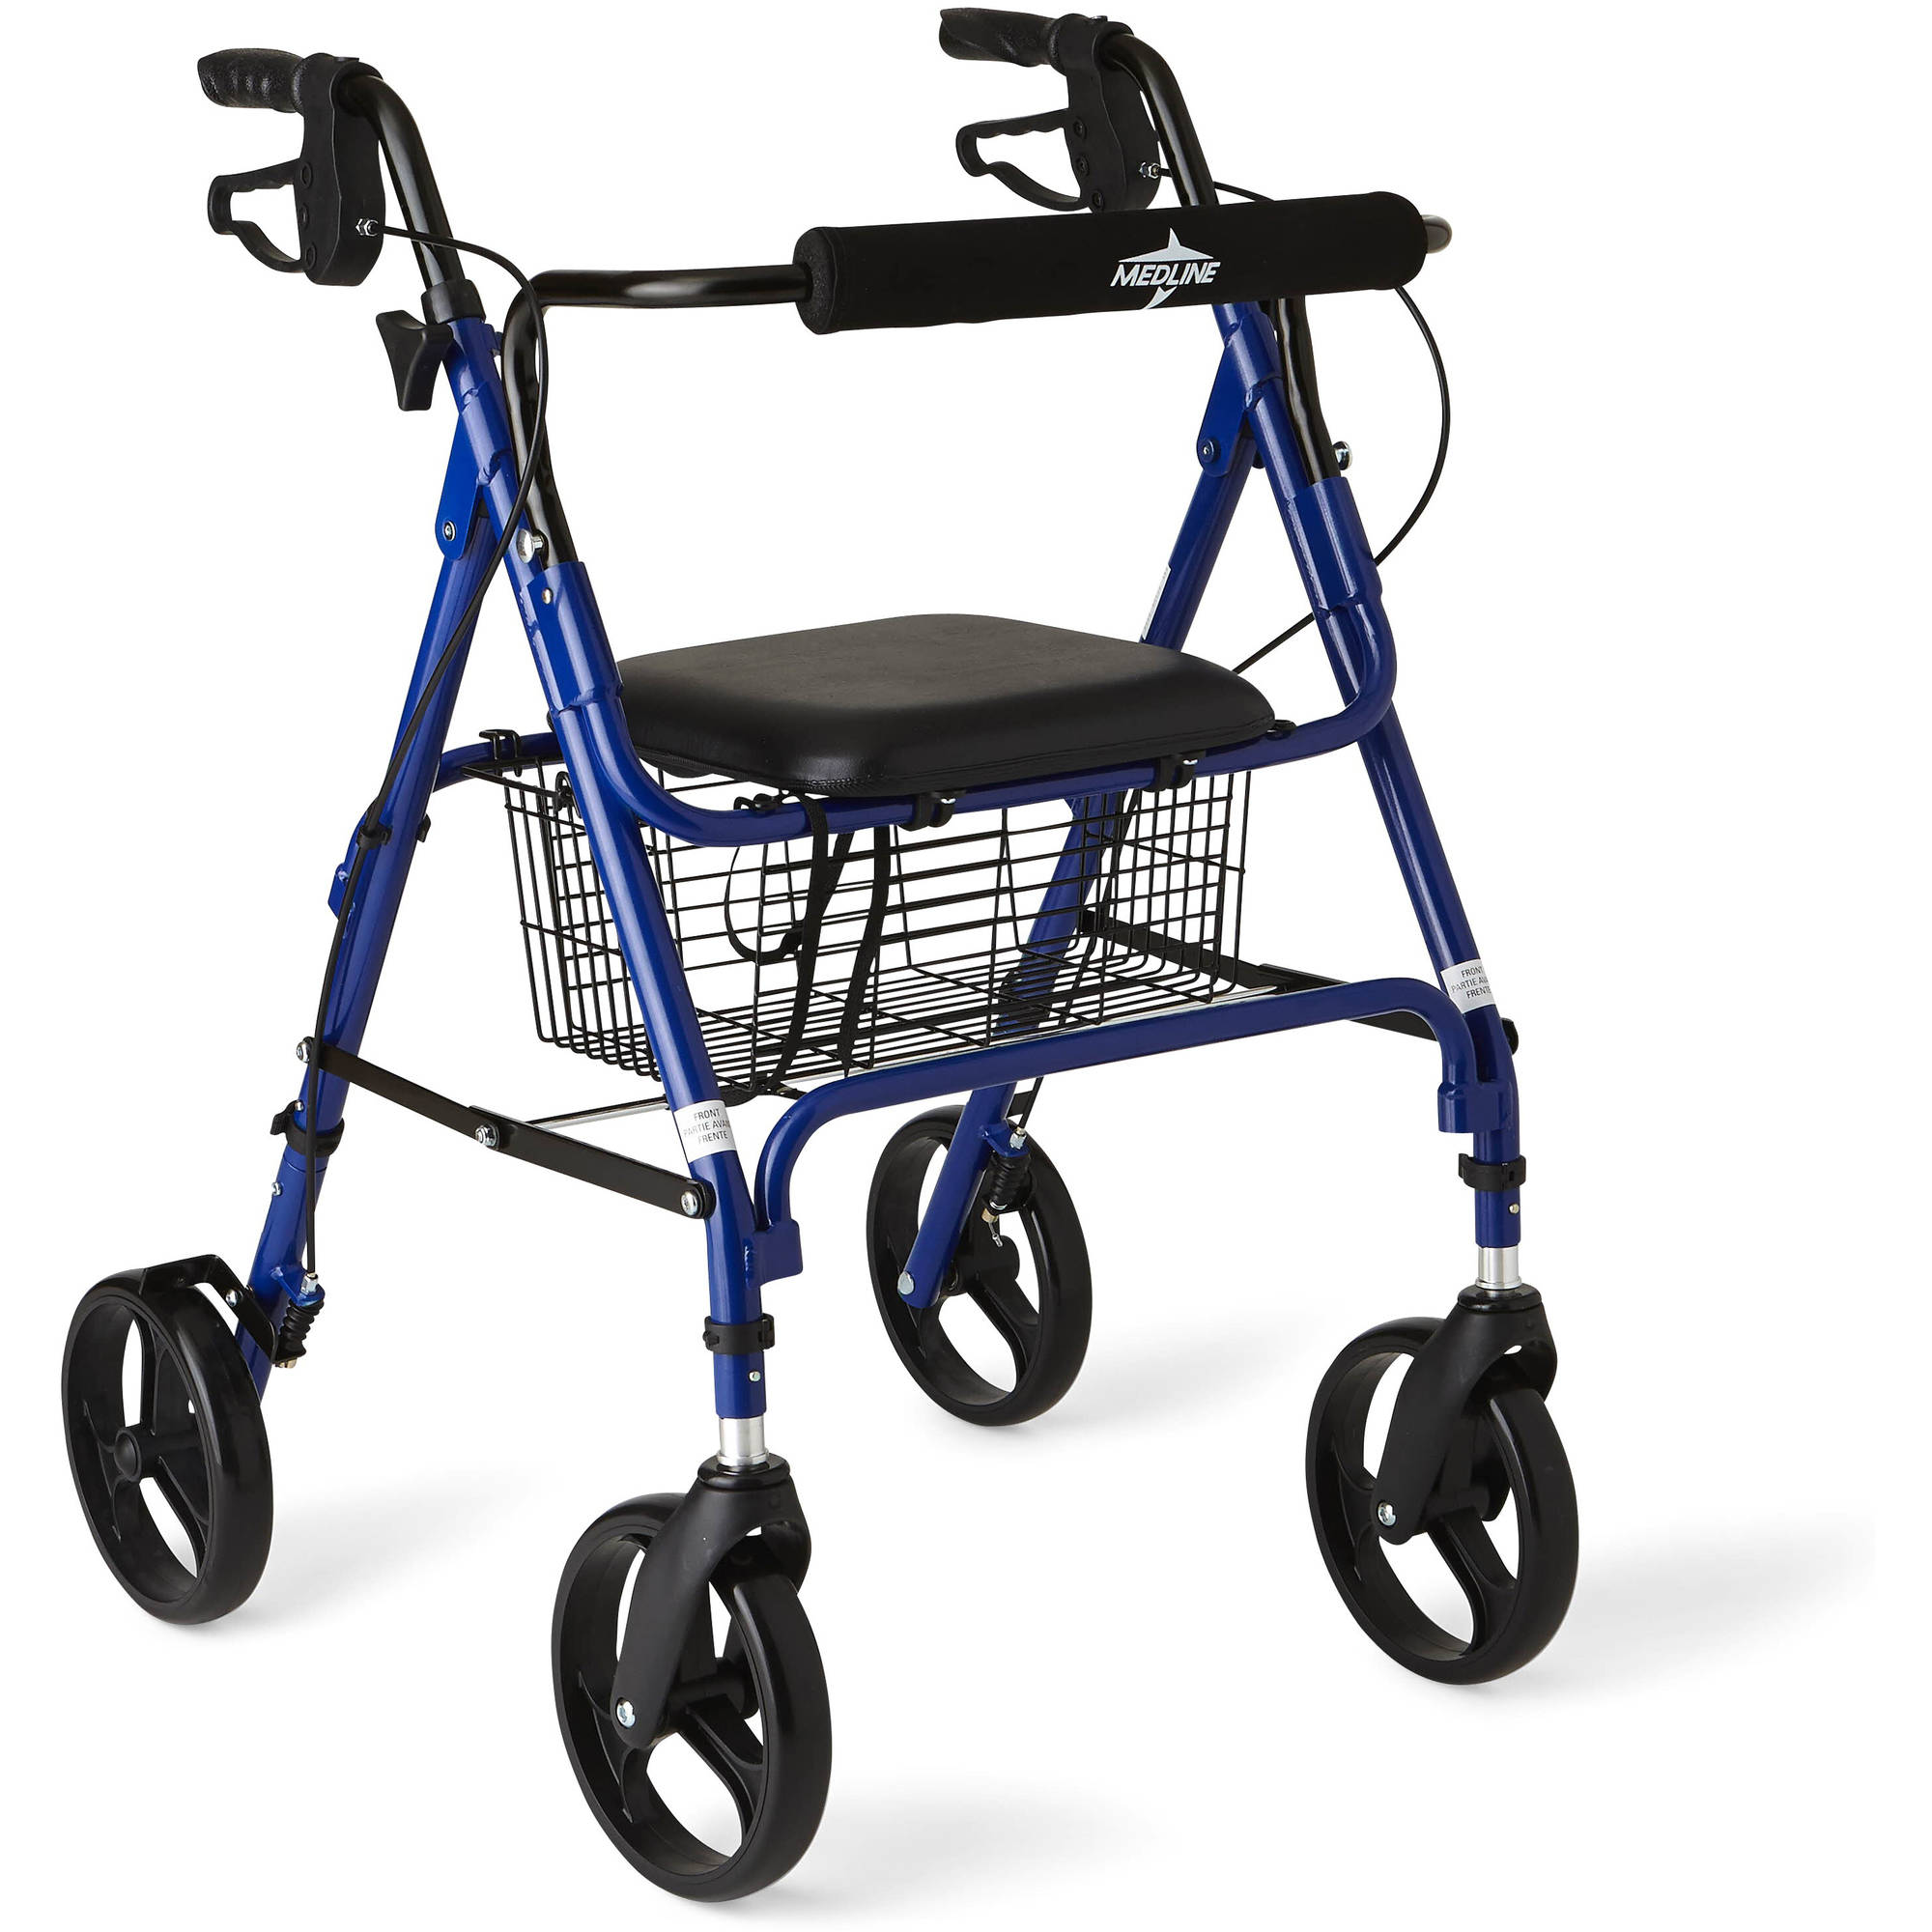 "Medline Deluxe Foldable Rollator Walker with 8"" Wheels, Blue"